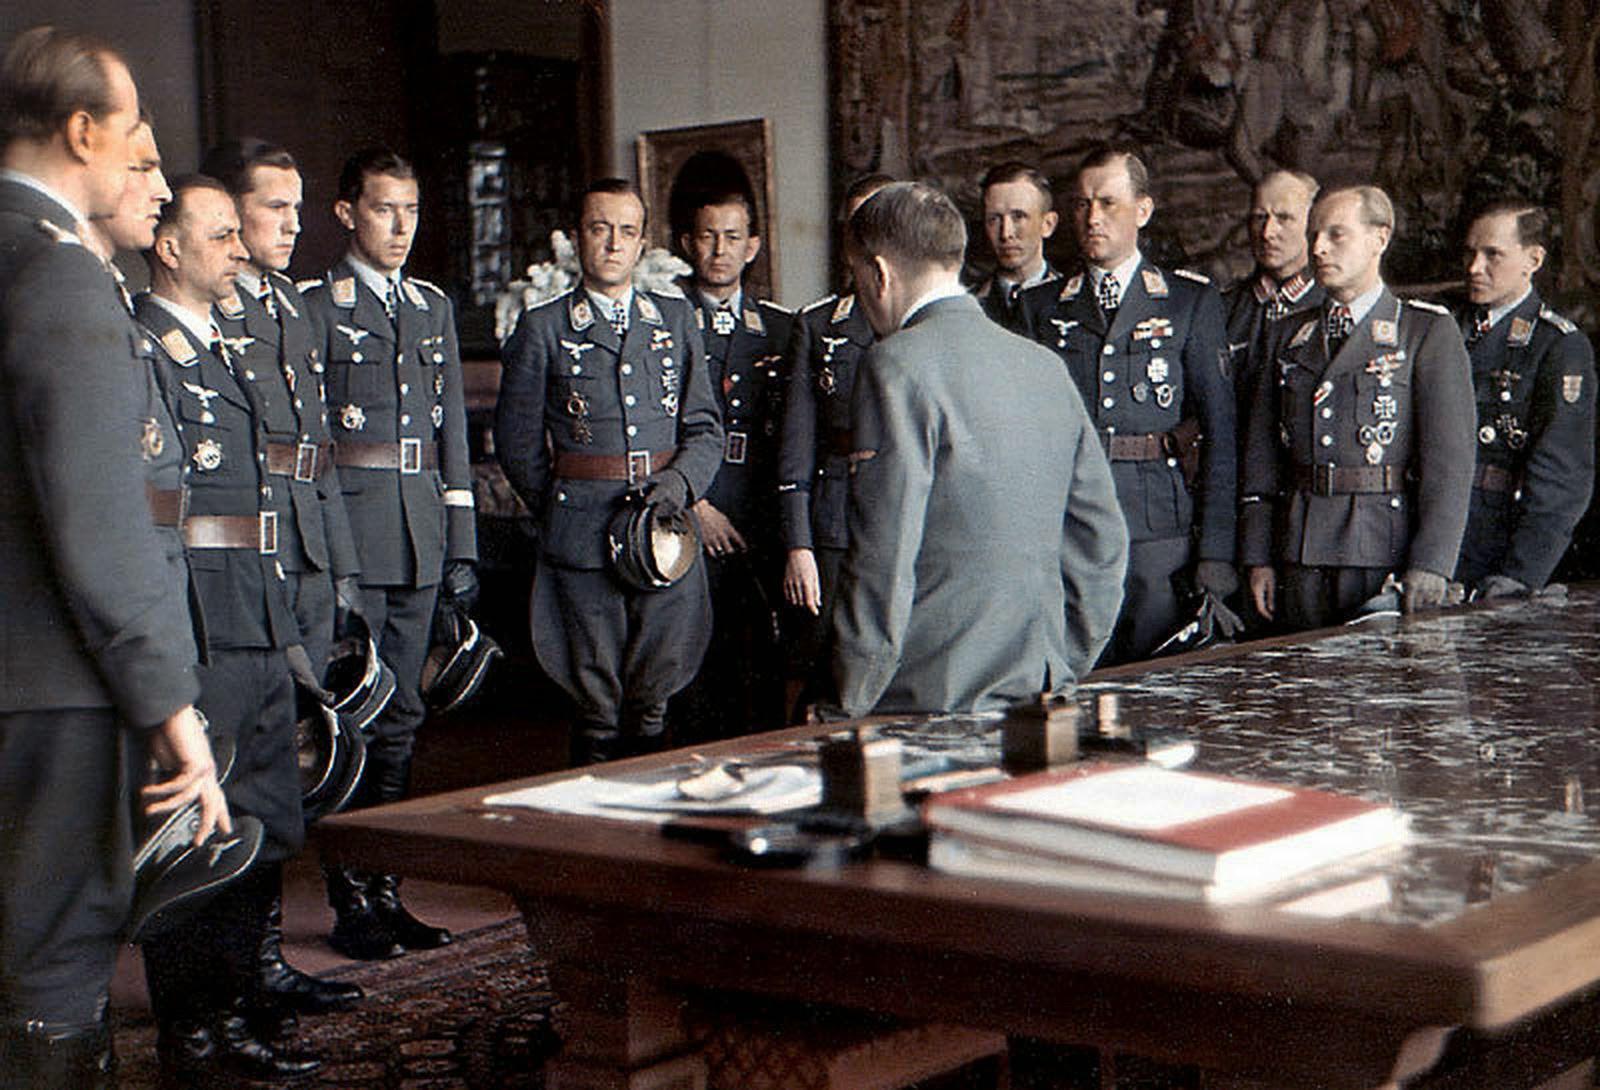 Luftwaffe-aces-meet-Hitler-after-an-awards-ceremony-at-the-Berghof-April-1944